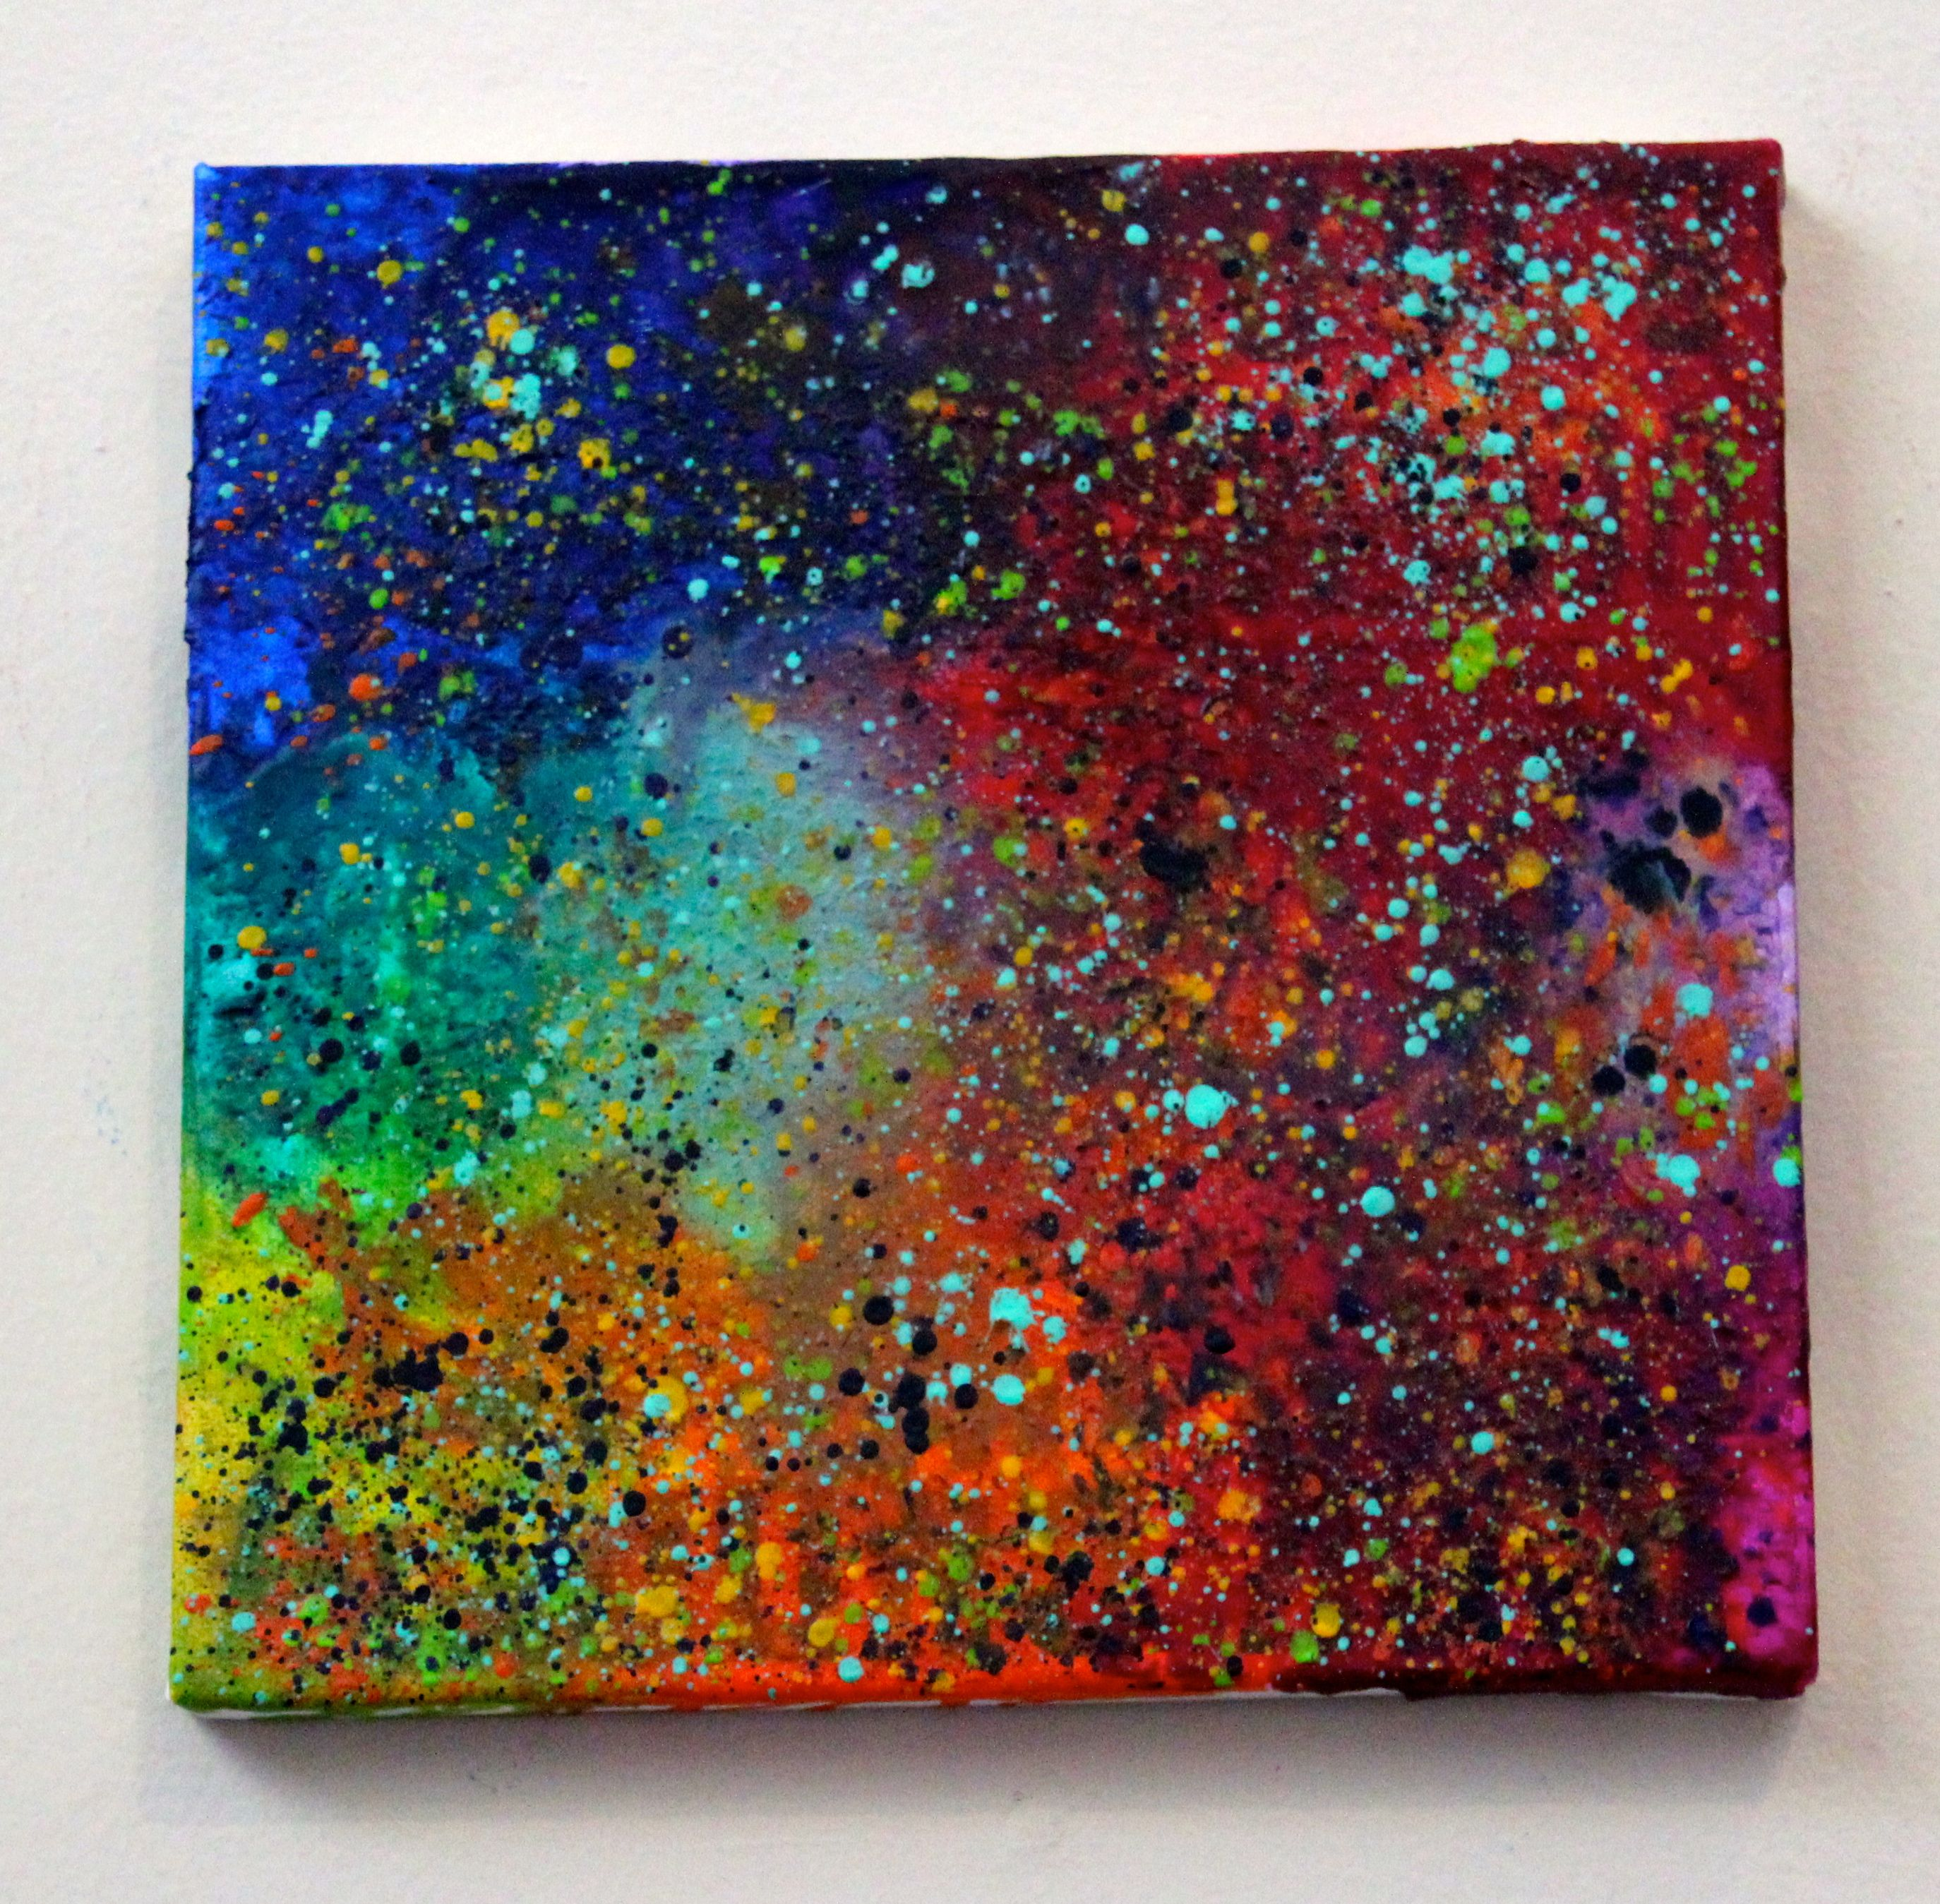 crayon art   wachsmalstifte   Pinterest   Leinwand gestalten, Kunst ...